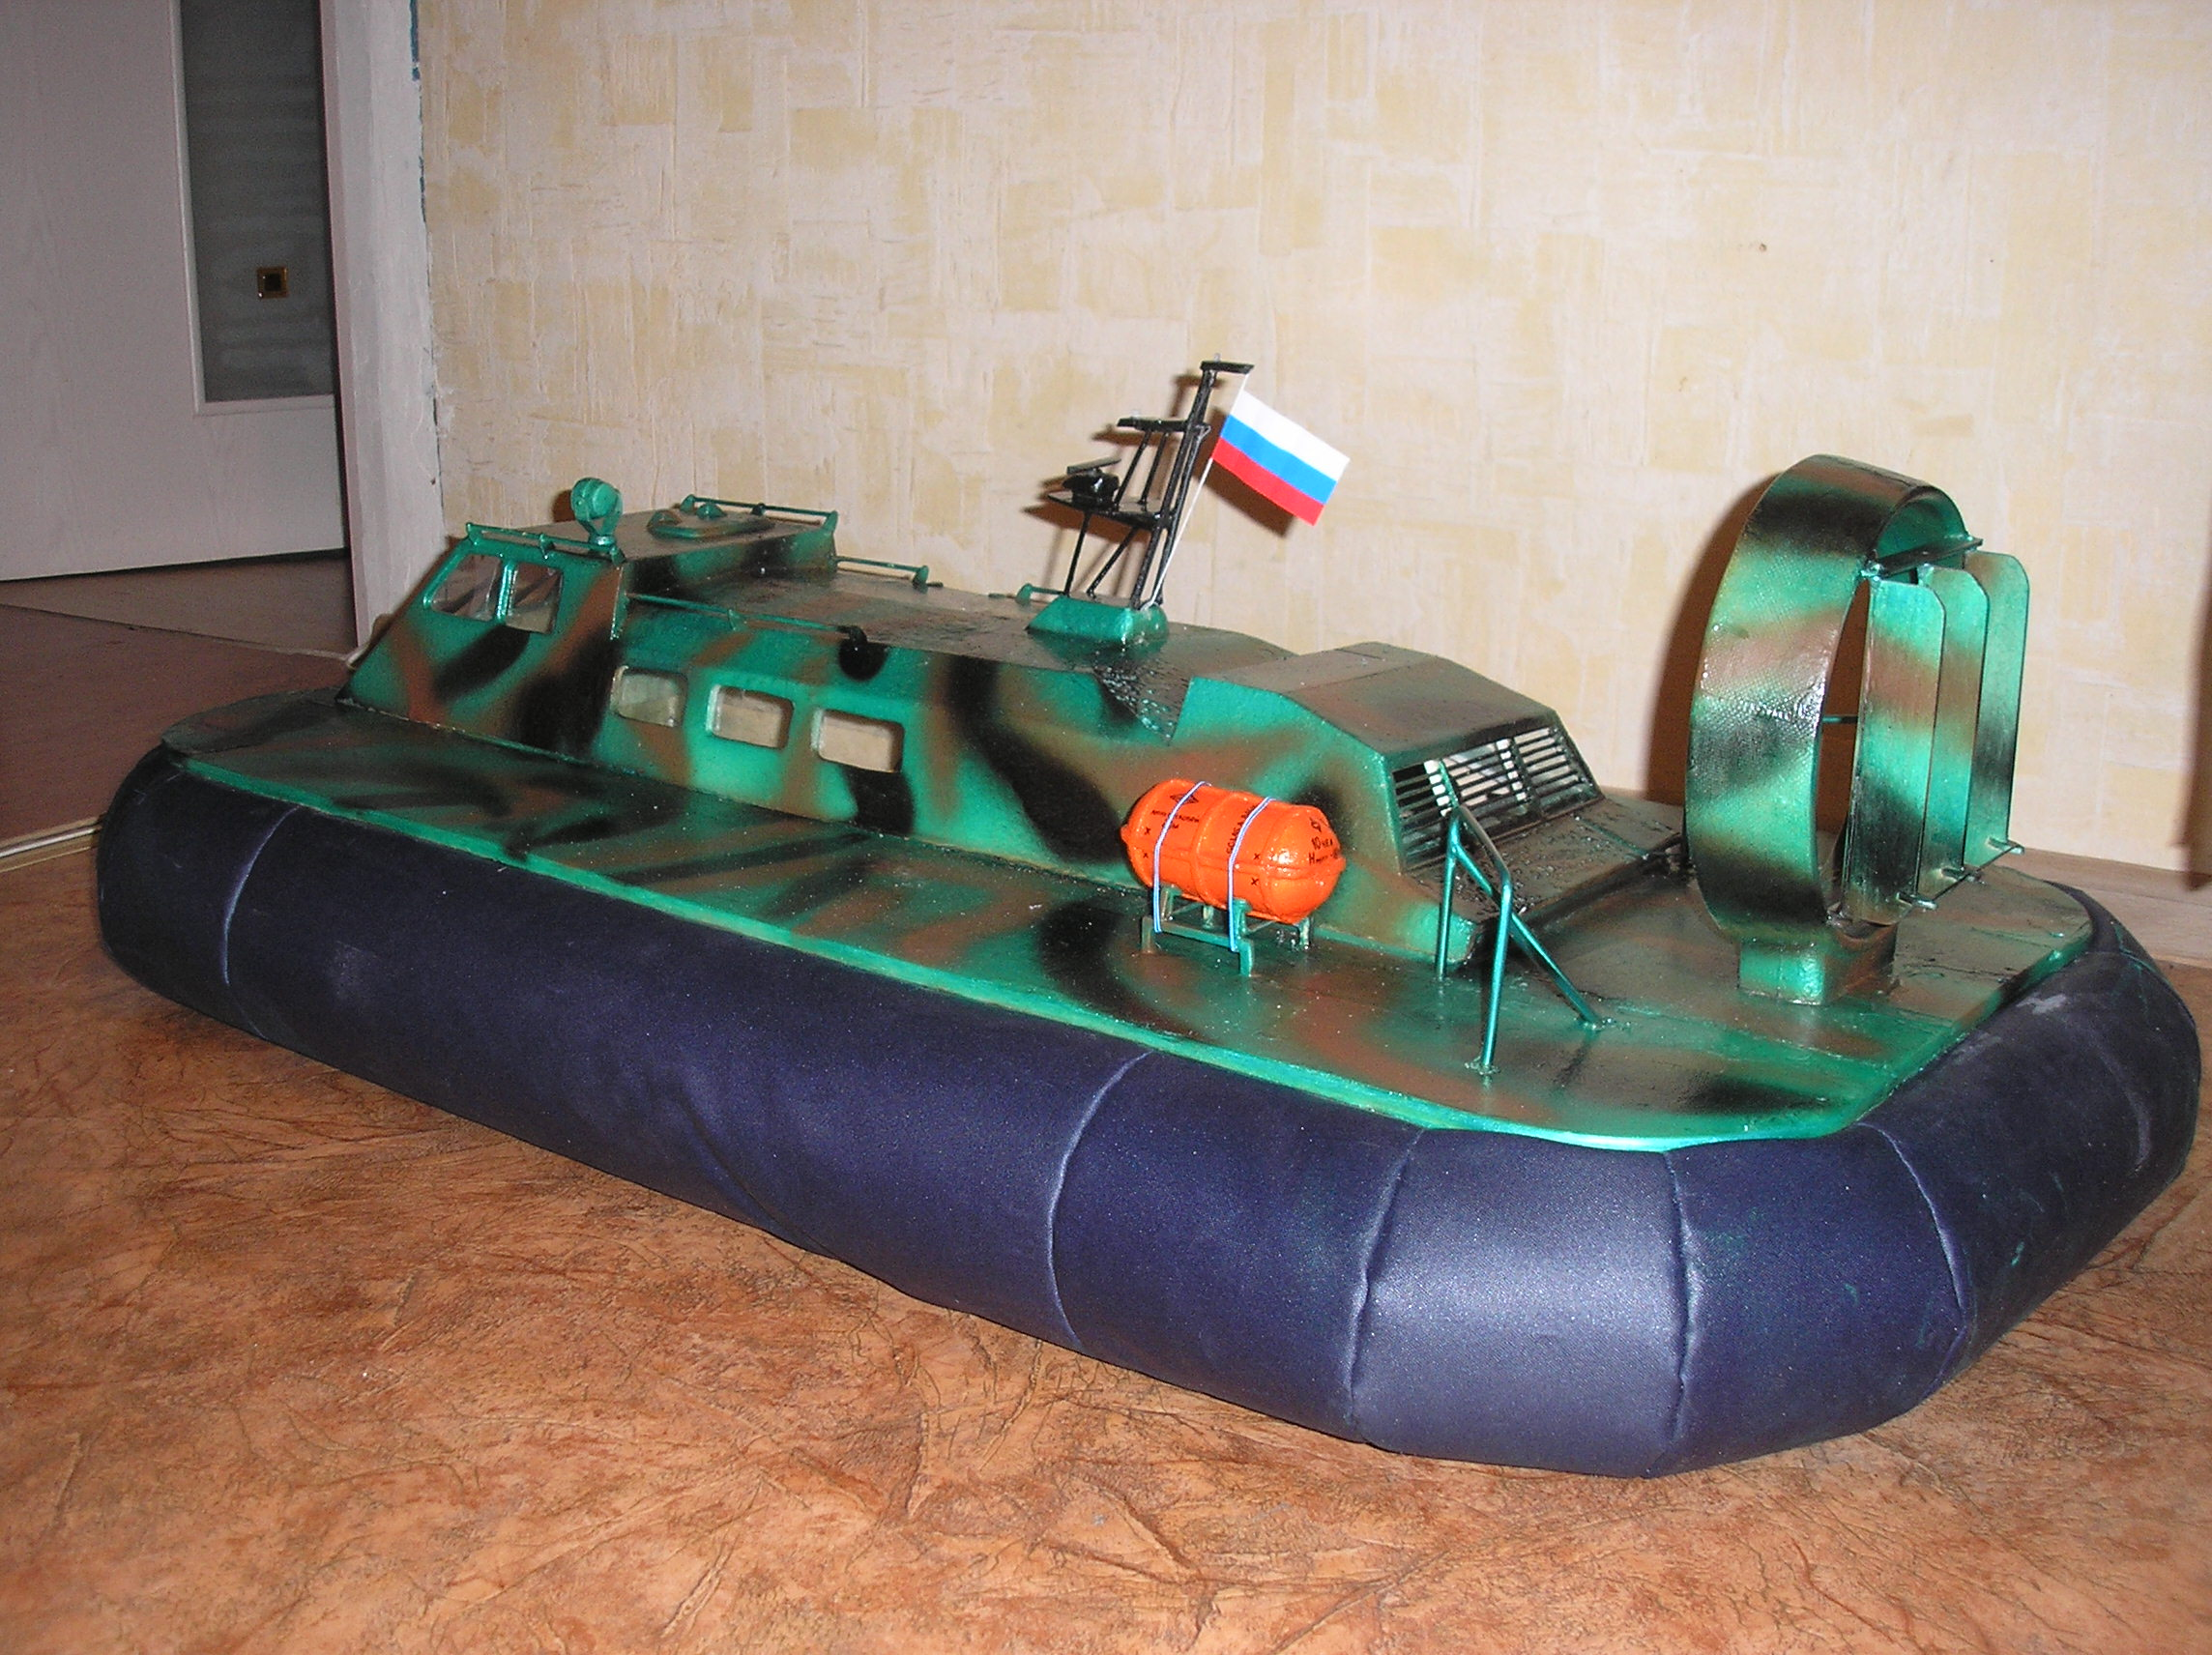 Игрушка на воздушной подушке своими руками 86